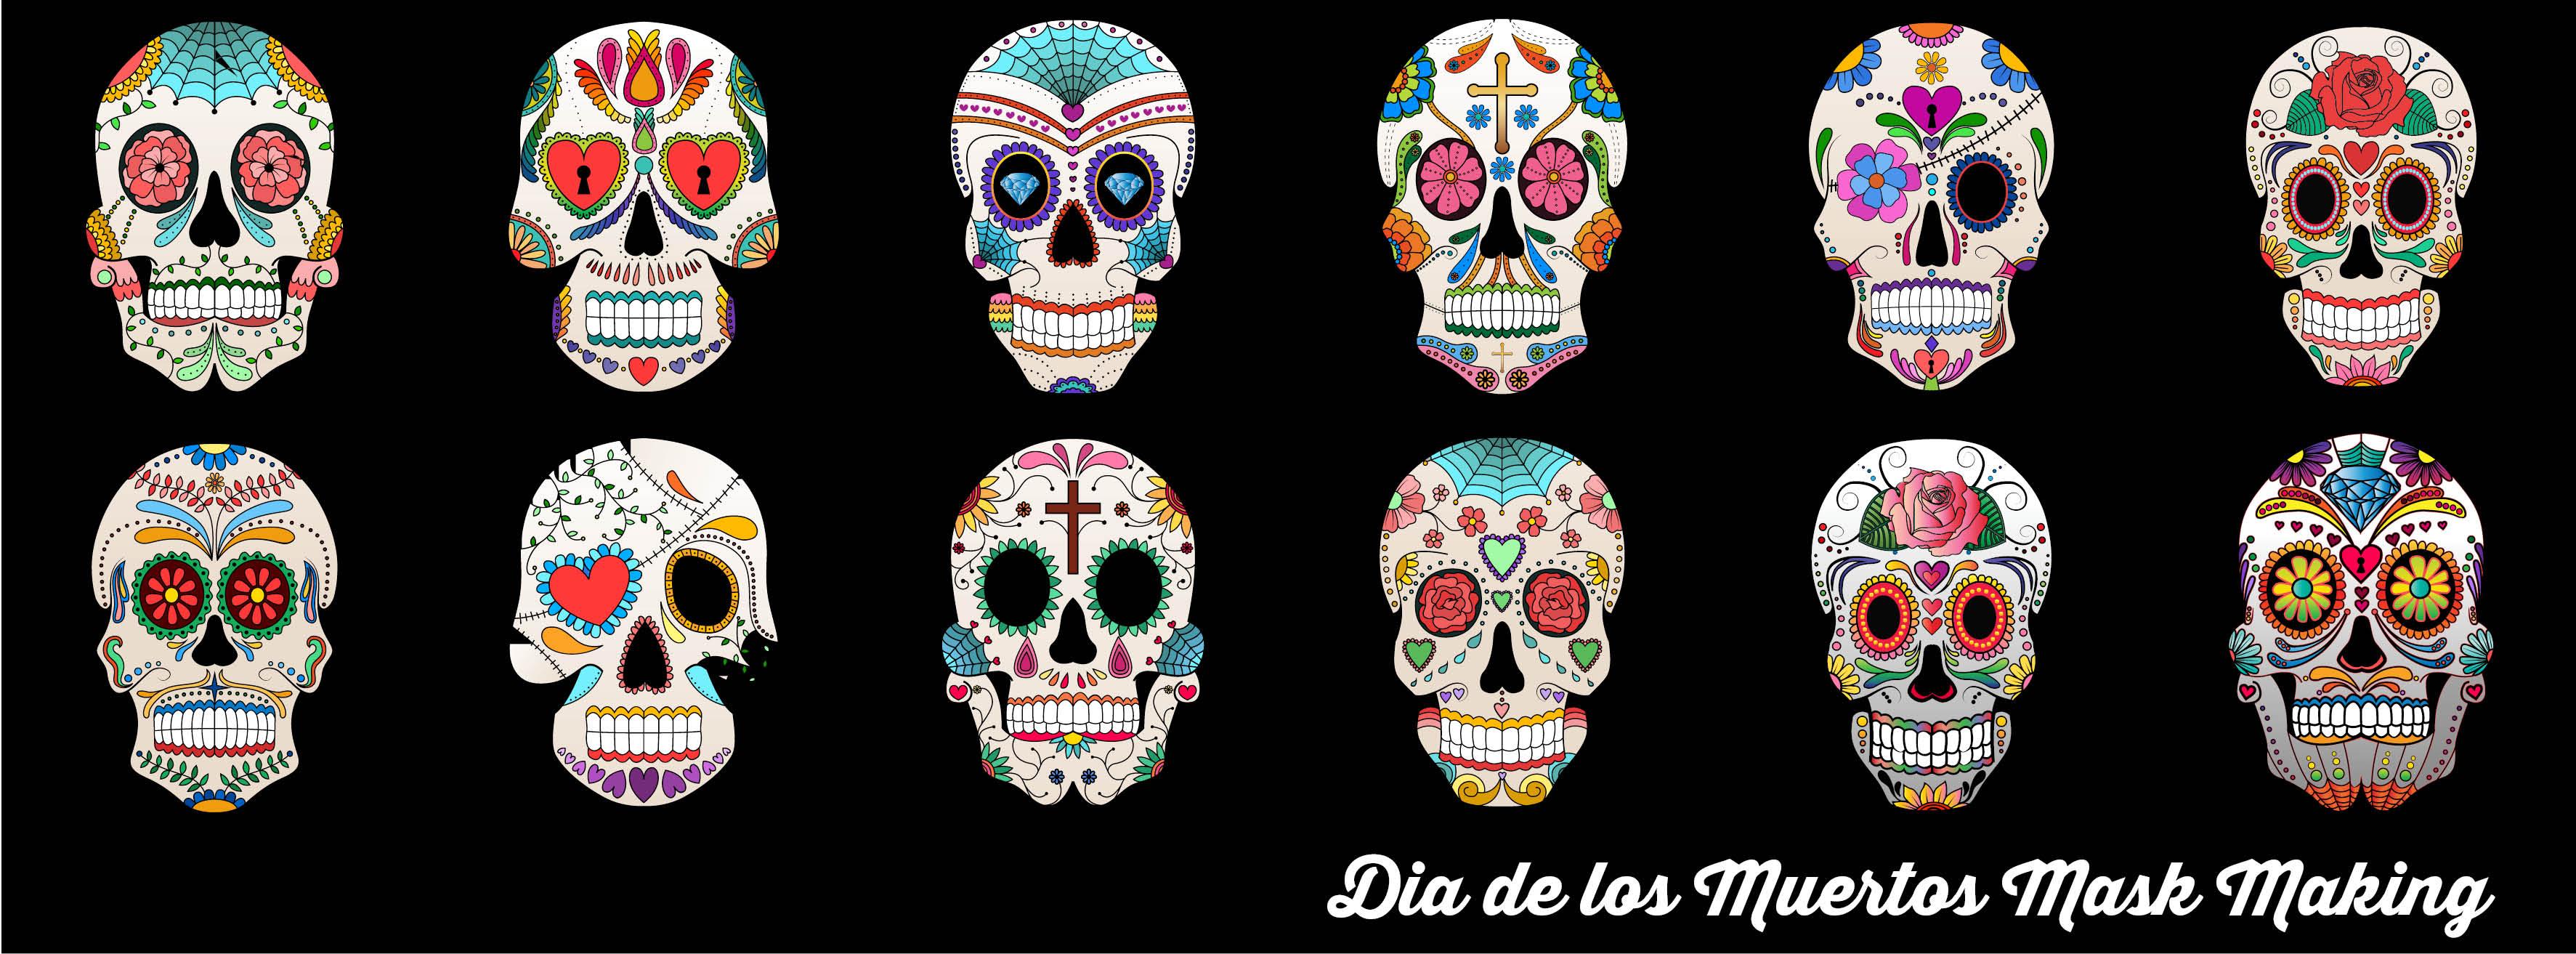 Dia de los Muertos Mask Making